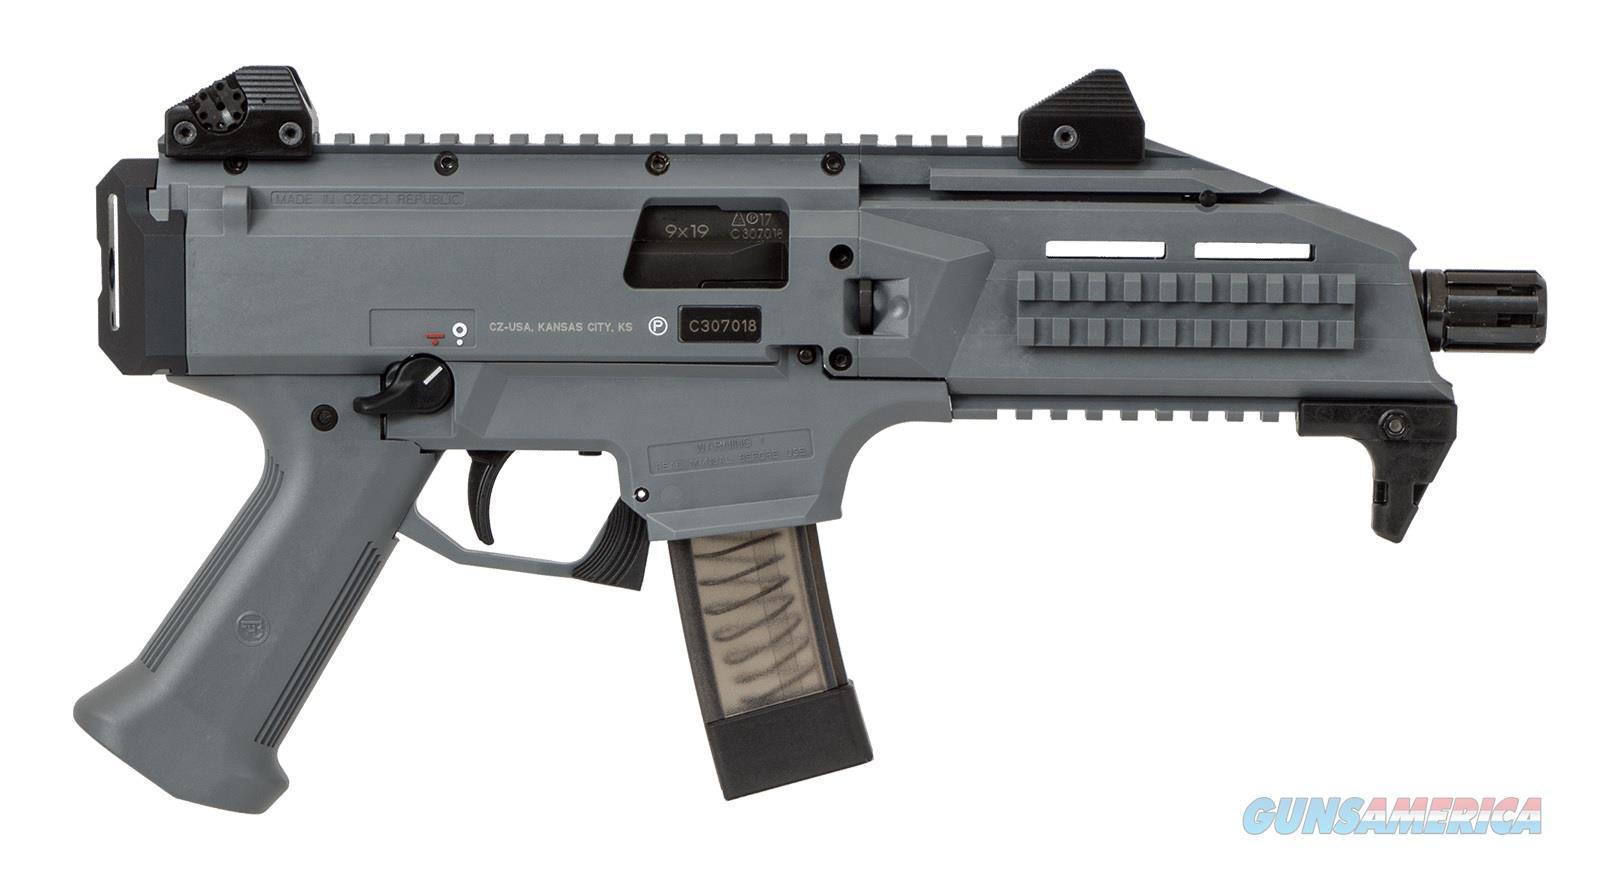 "CZ-USA Scorpion EVO 3 S1 9mm Battleship Grey 7.72"" TB 91356   Guns > Pistols > CZ Pistols"